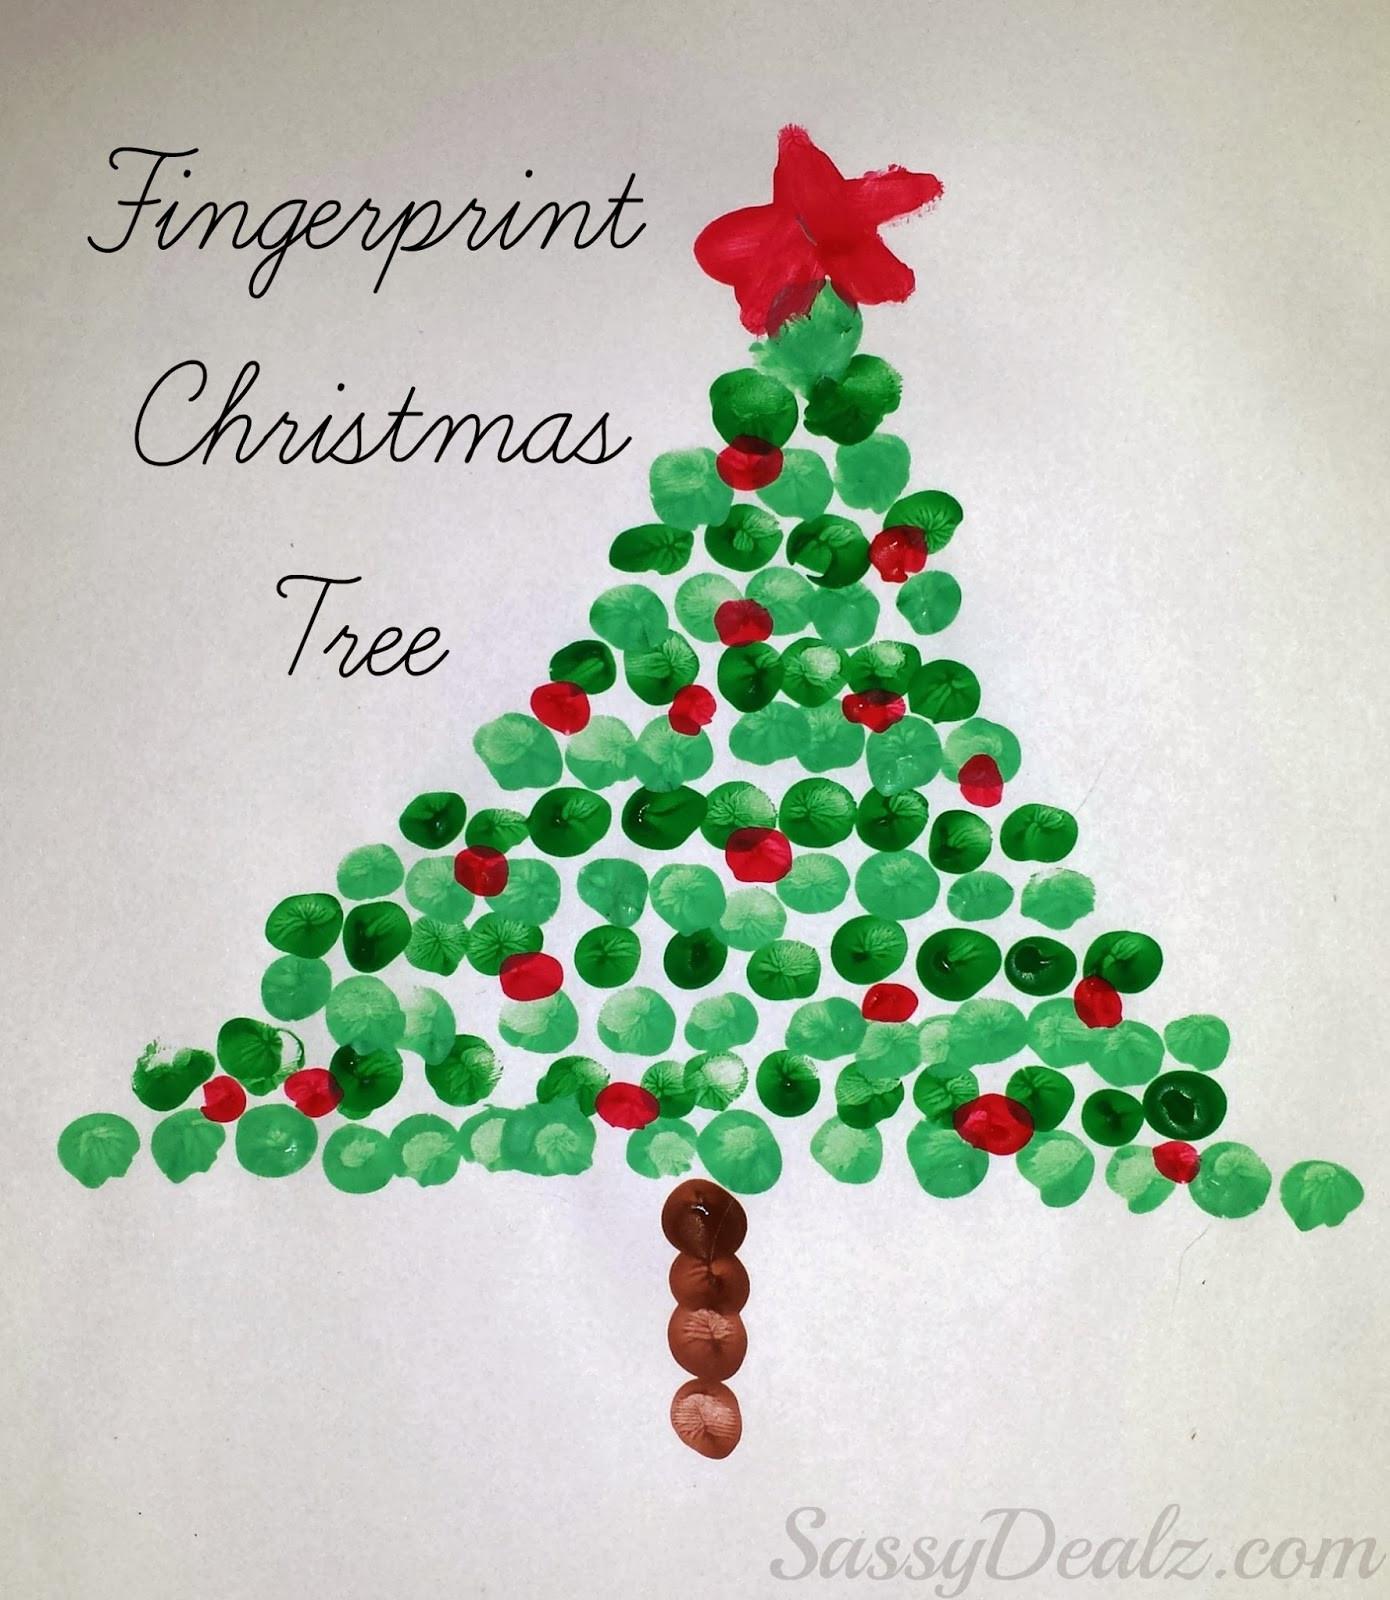 Christmas Art Ideas  Christmas Fingerprint Crafts U Create